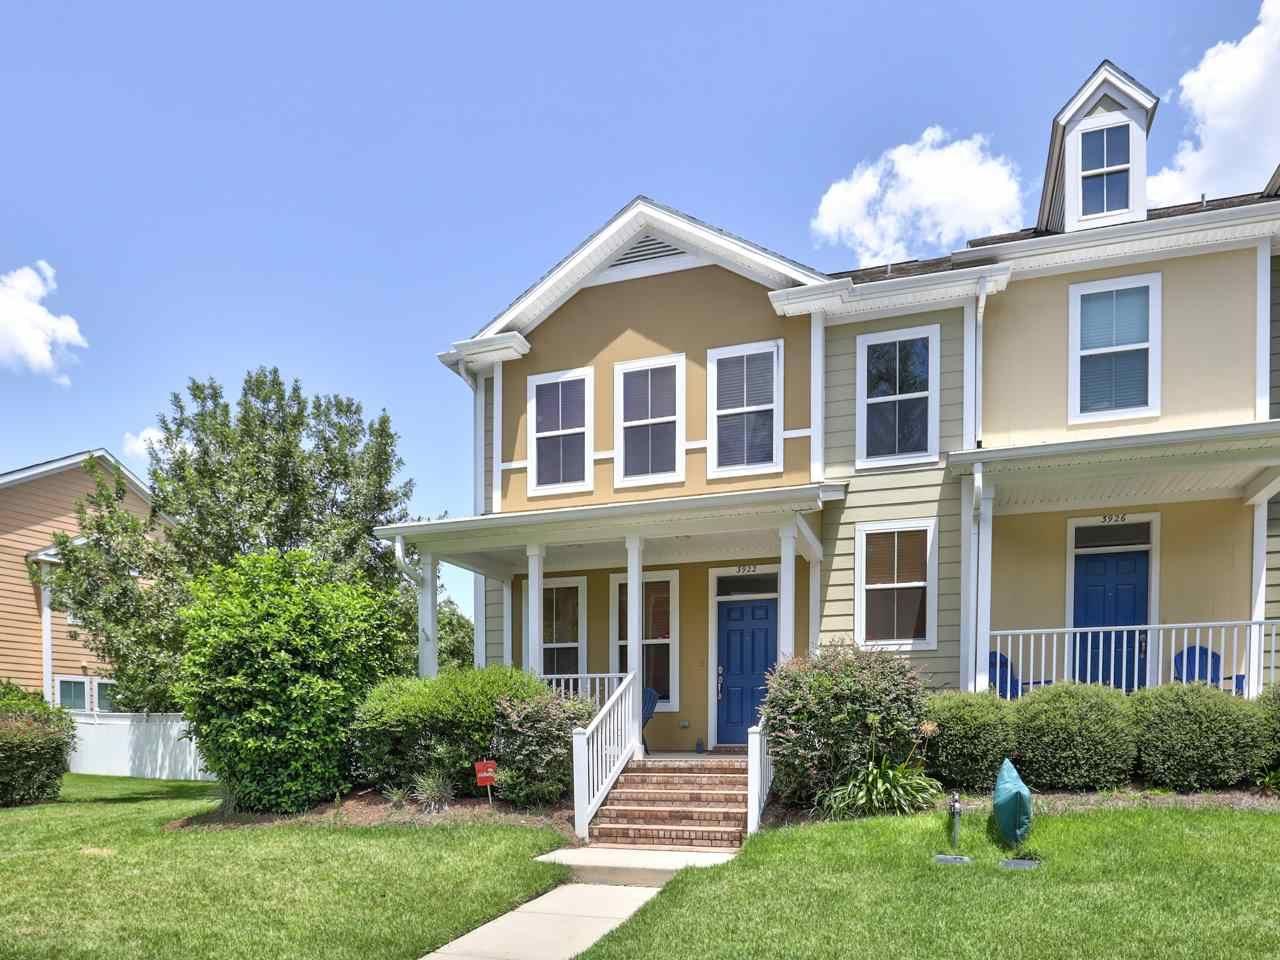 Photo of 3922 Shumard Oak Boulevard, TALLAHASSEE, FL 32311 (MLS # 322040)